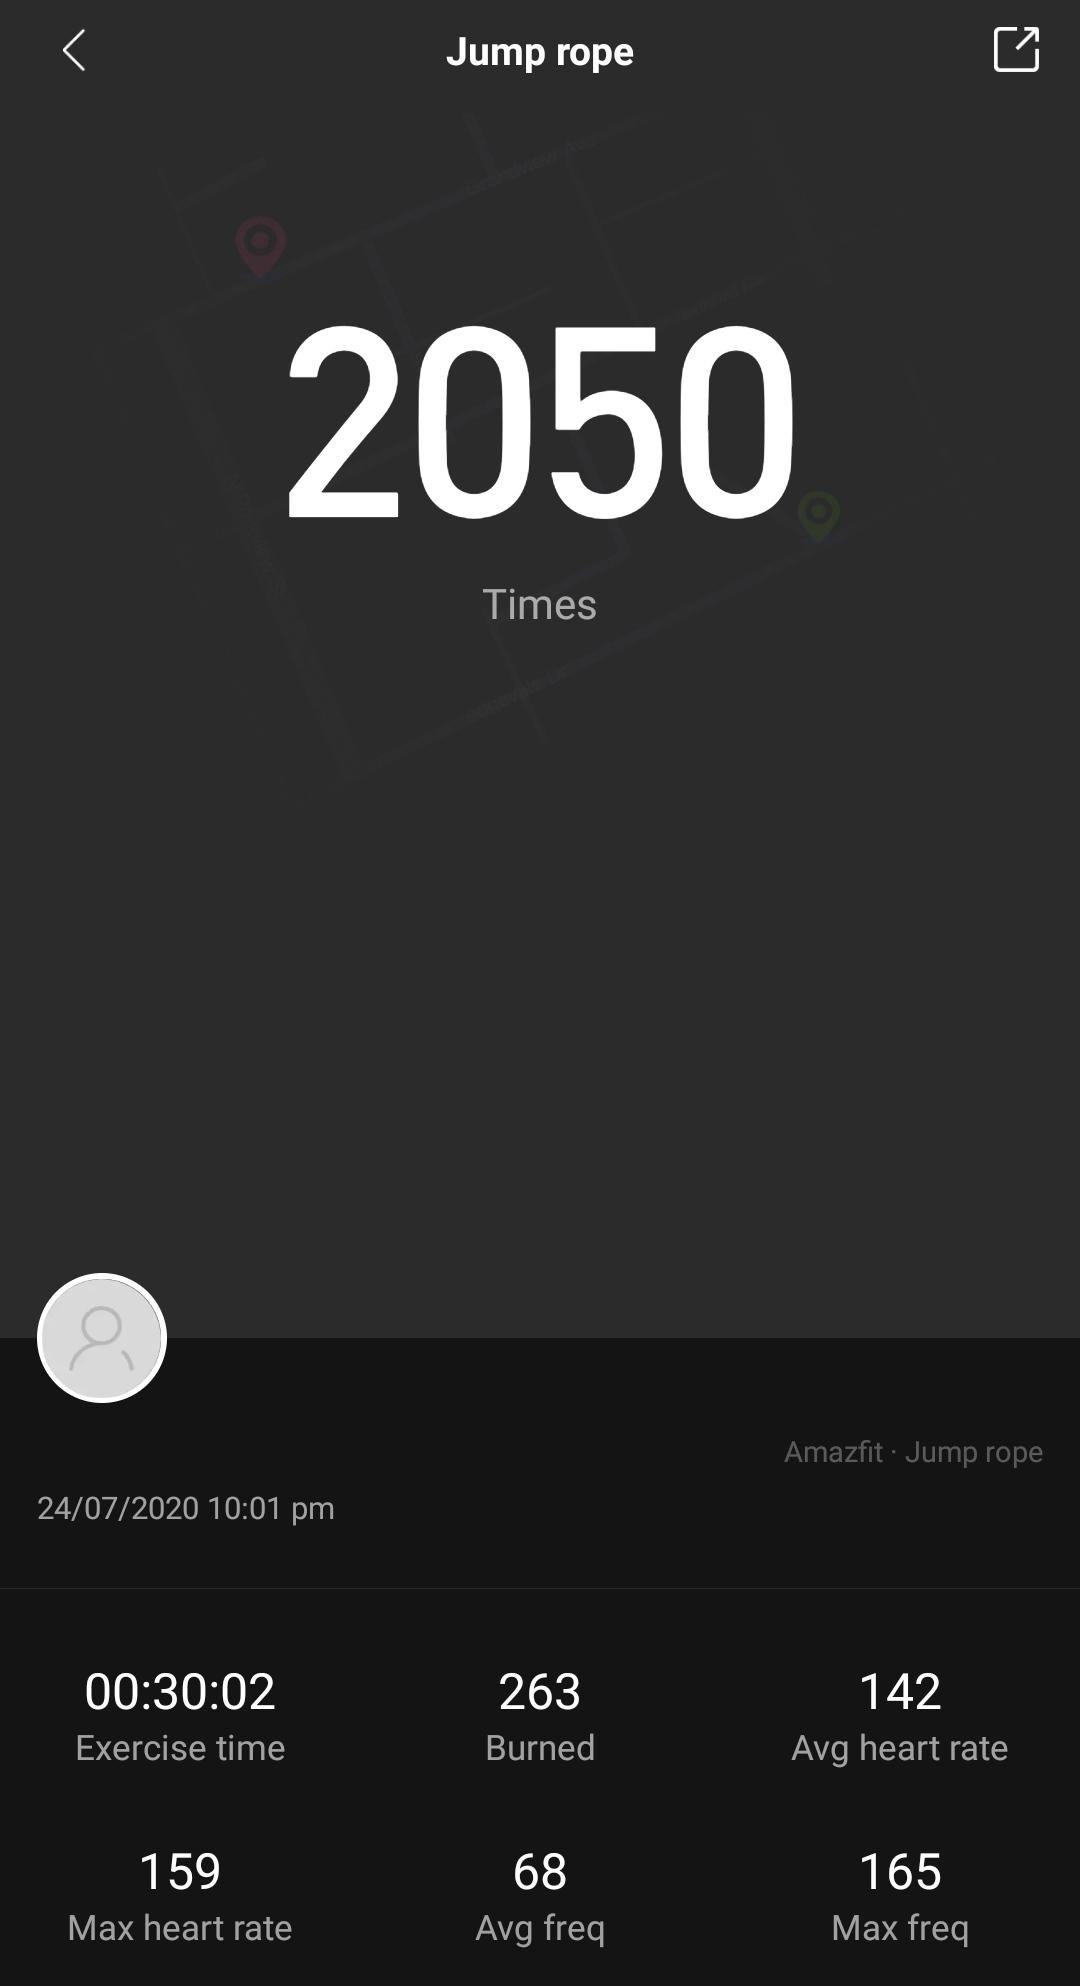 IMG_20200724_223454.jpg